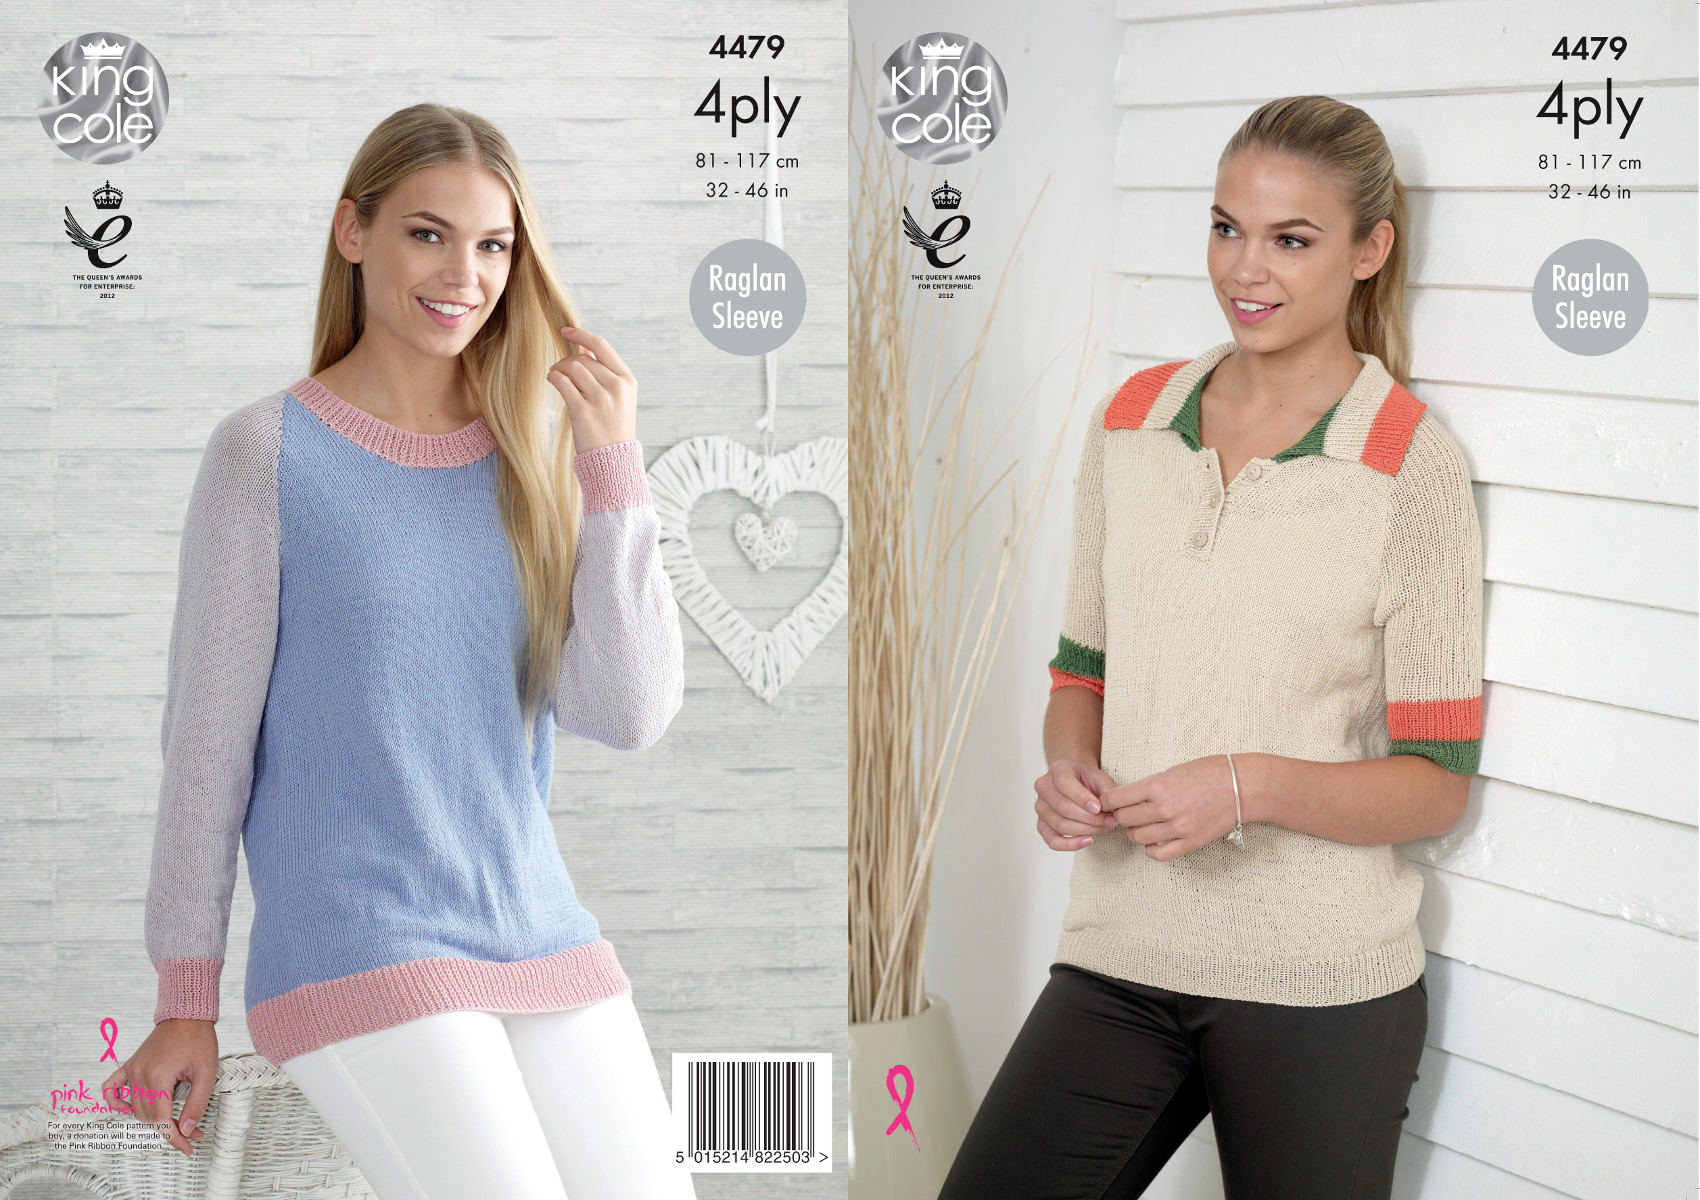 King Cole 4 Ply Knitting Pattern Ladies Raglan Sleeve Polo Shirt ...